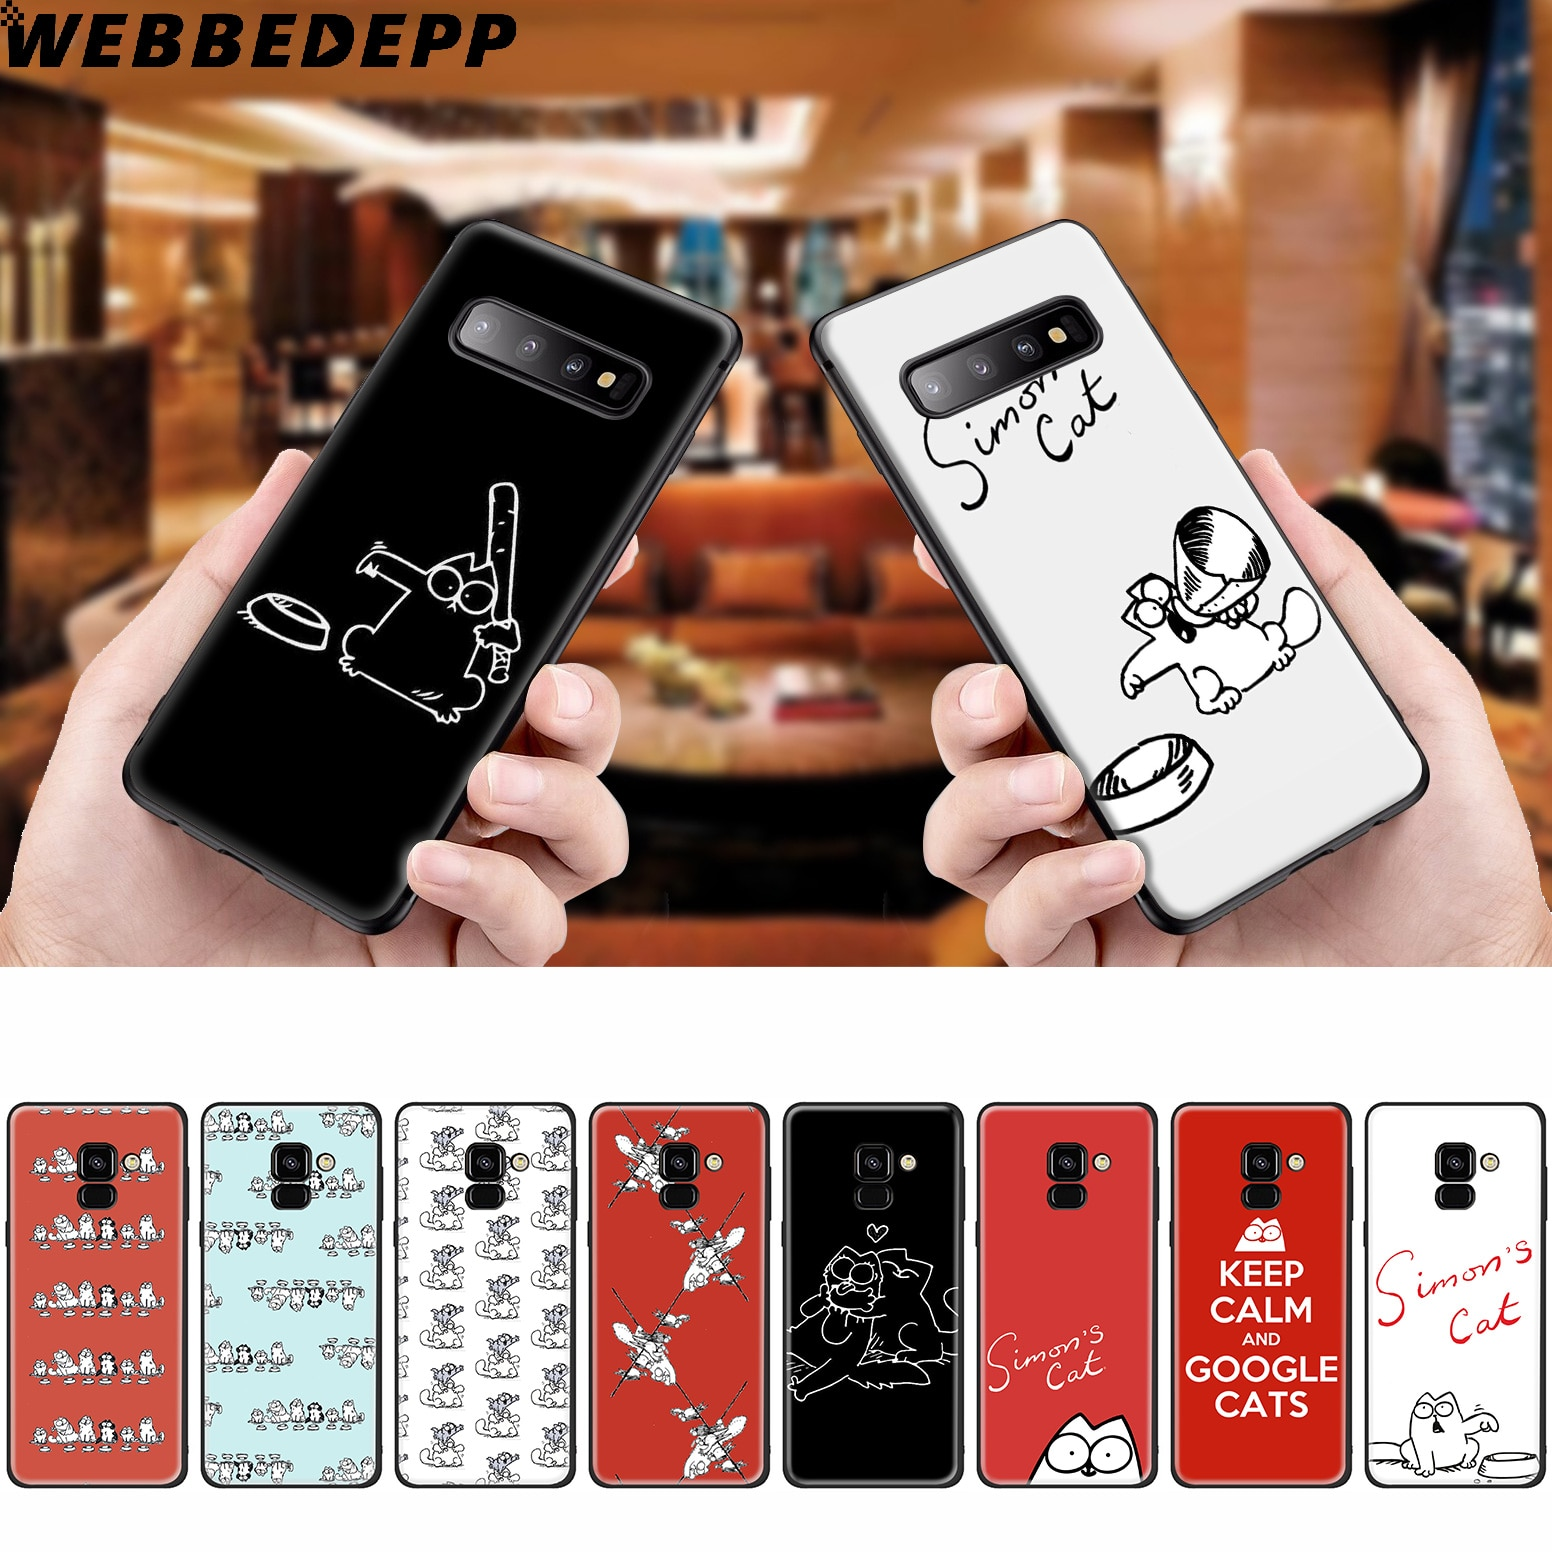 Funda blanda para Samsung Galaxy A50s A40s A30s A20s A10s funda para teléfono suave TPU